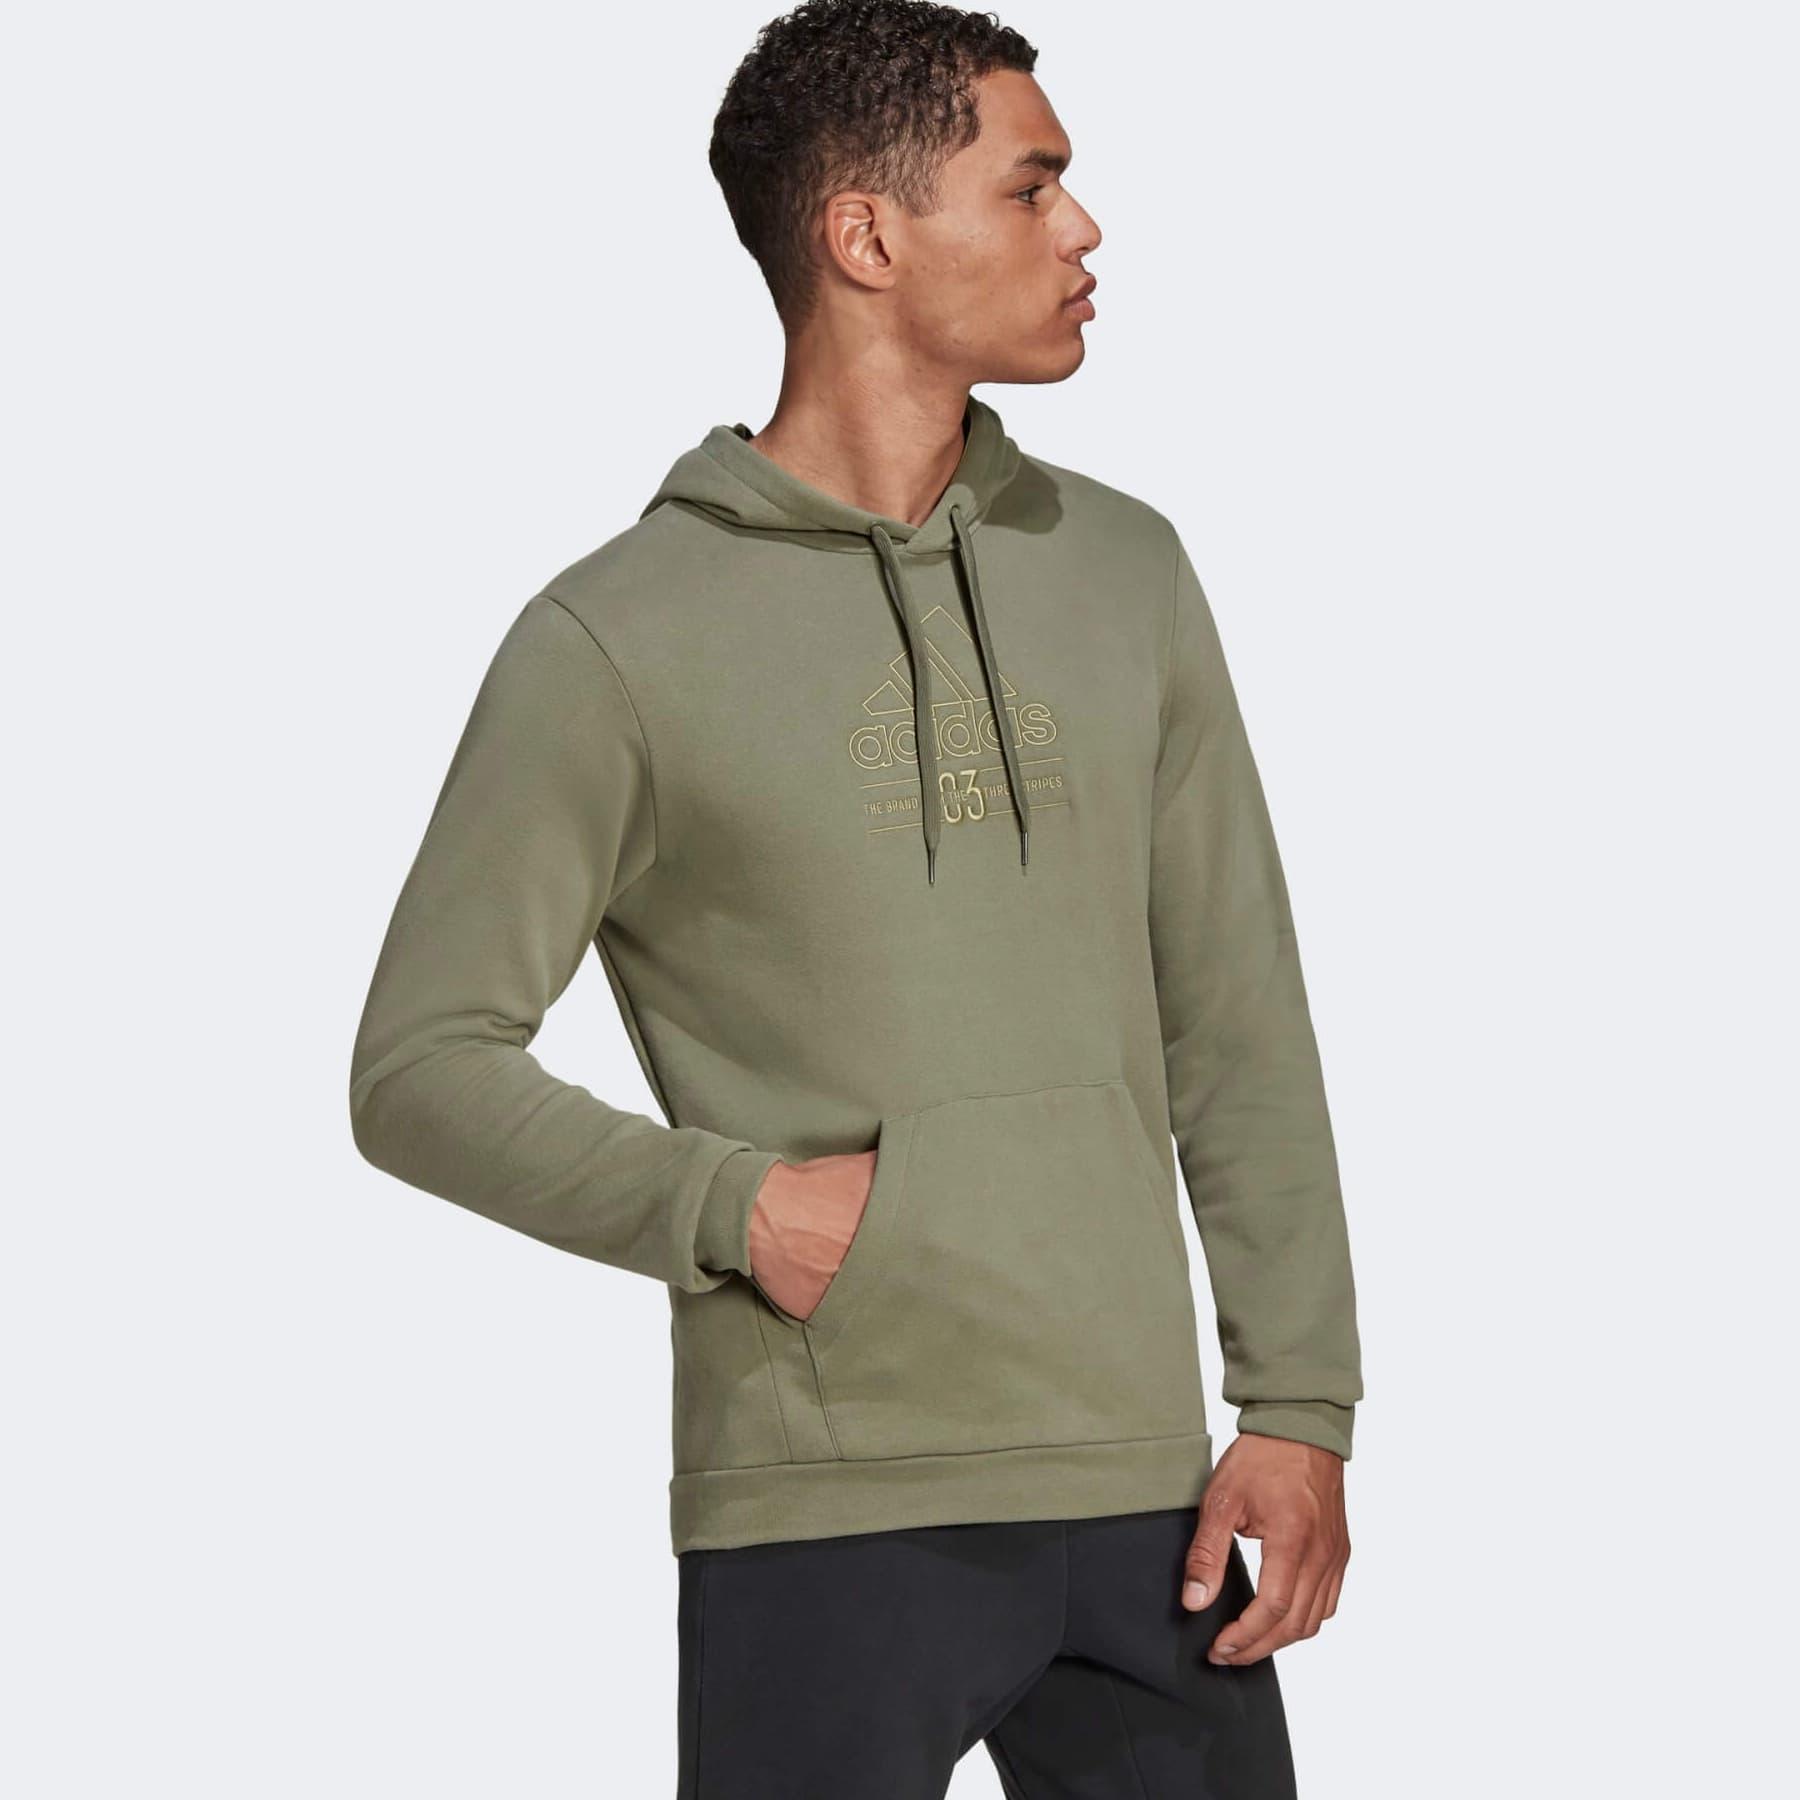 Brilliant Basics Erkek Yeşil Sweatshirt